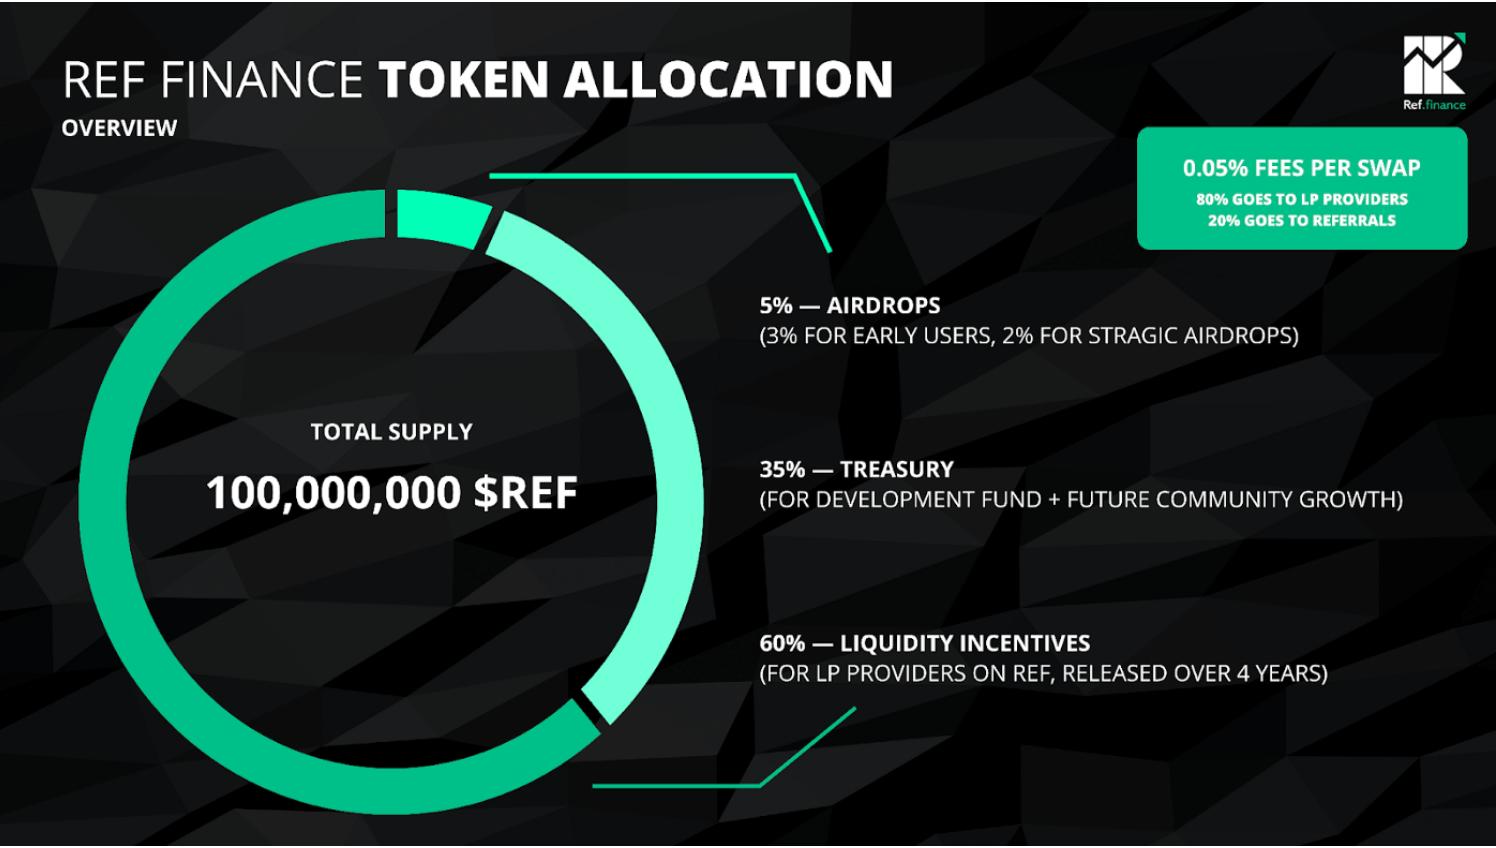 Ref Finance Token Allocation